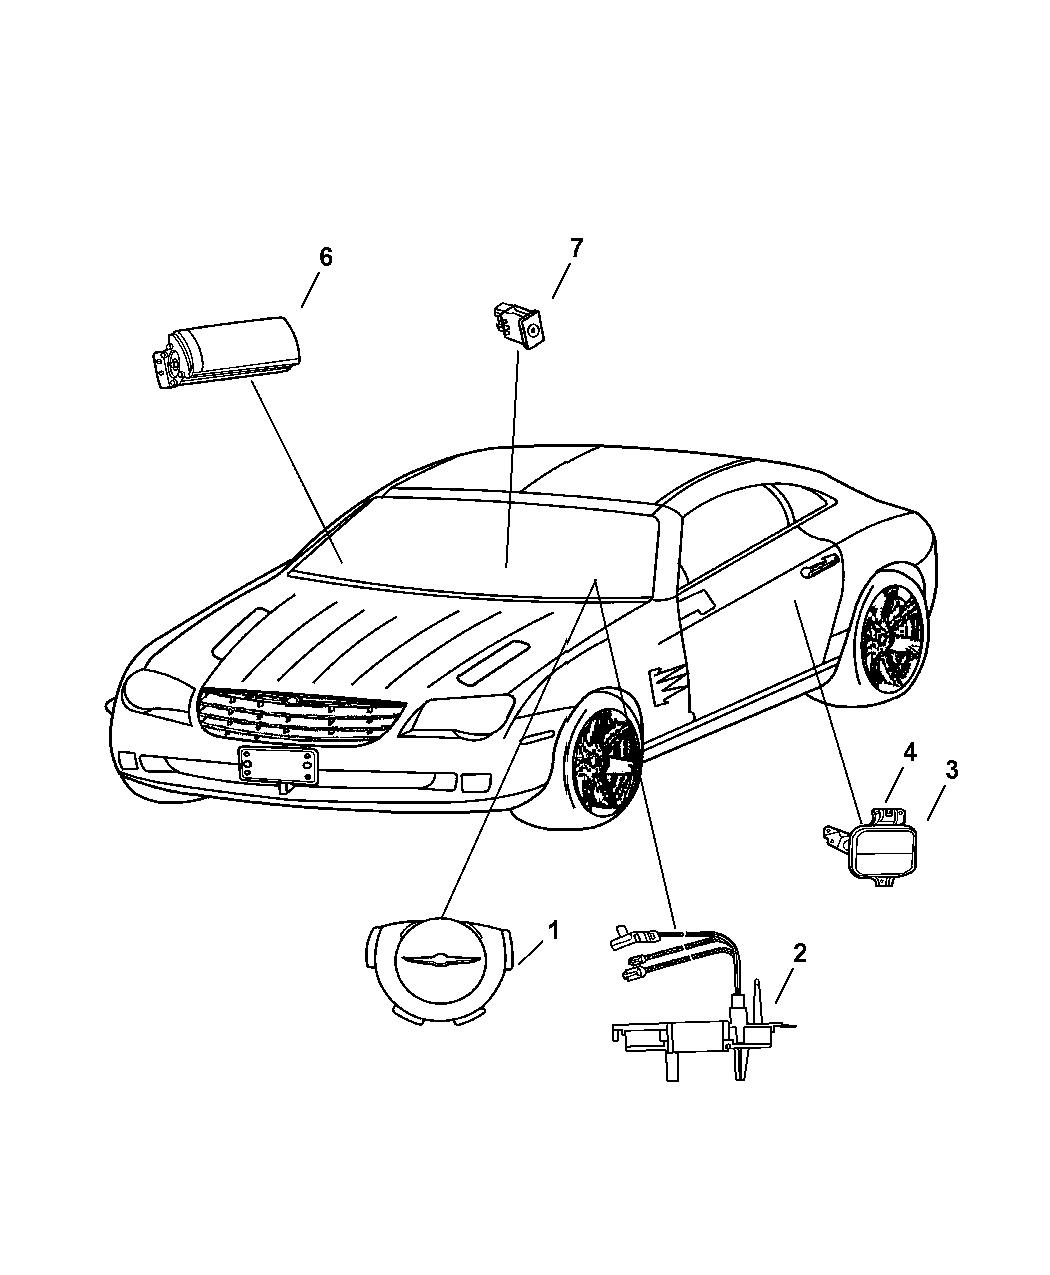 2007 Chrysler Crossfire Air Bags & Clock Spring